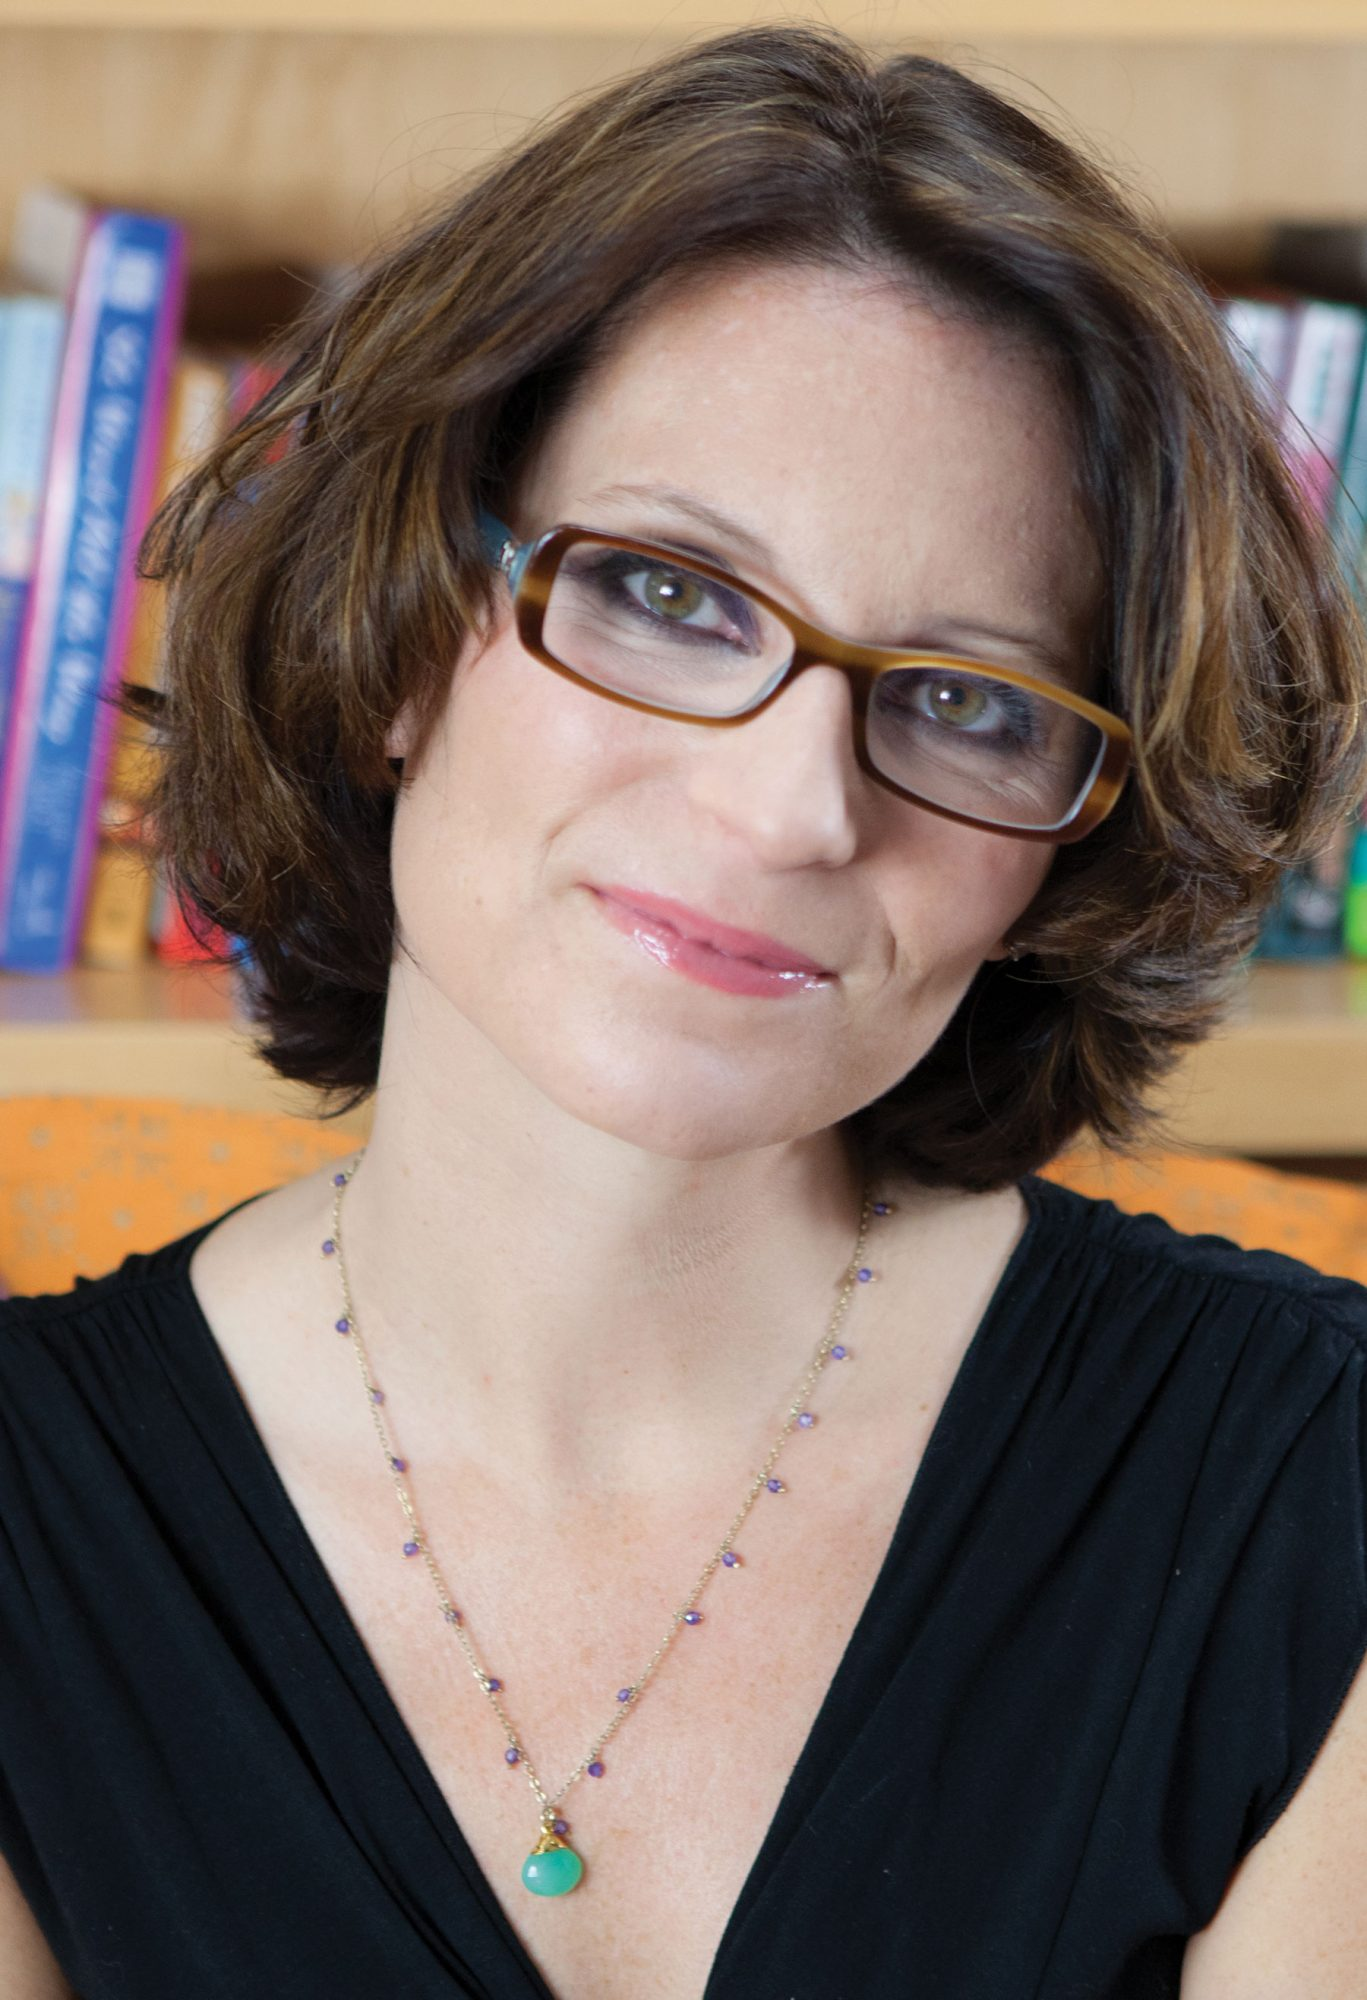 Meg Cabot author photoCR: Lisa DeTullio Russell